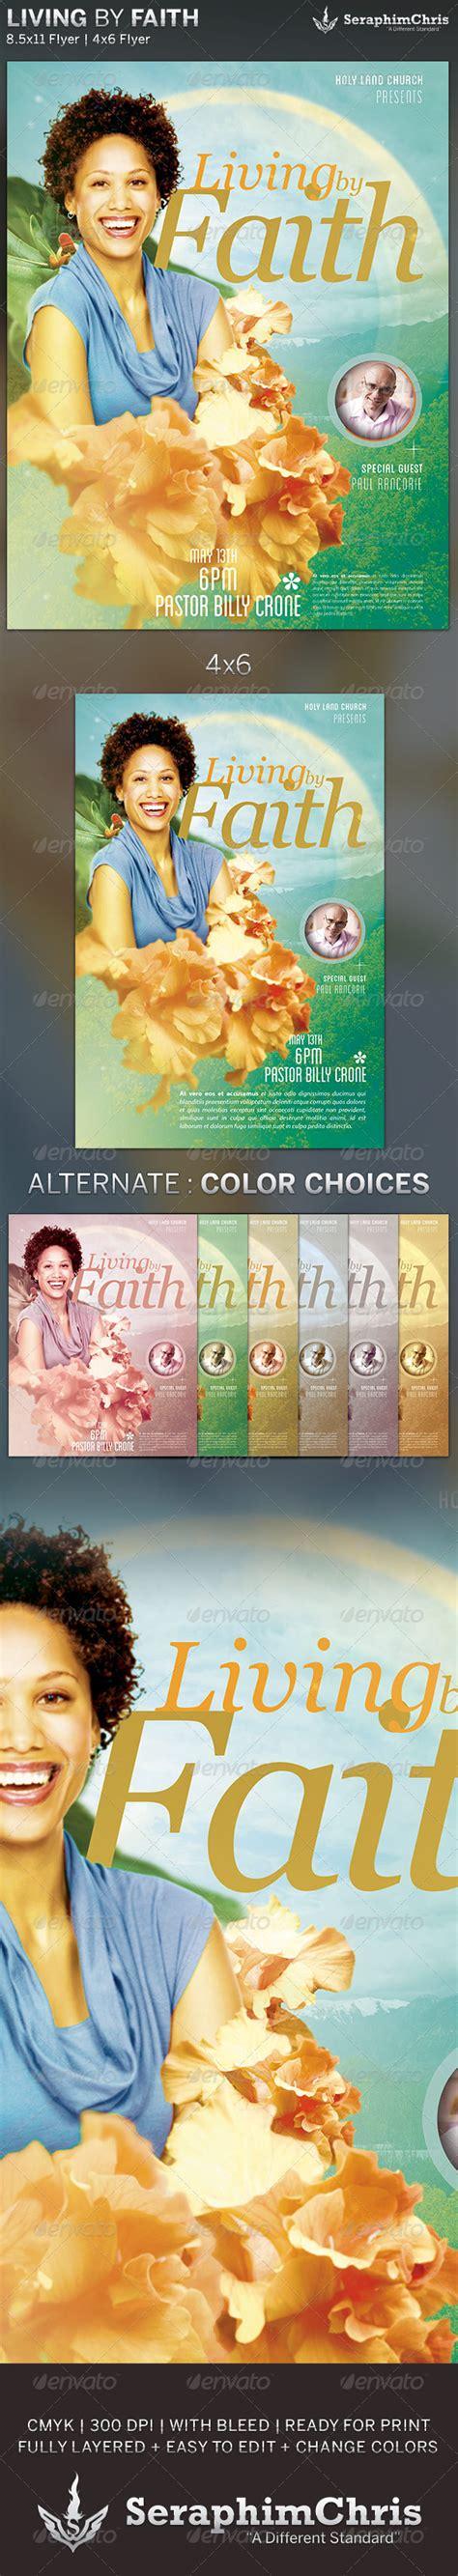 Living By Faith Church Flyer Template By Seraphimchris Graphicriver Living Flyer Template